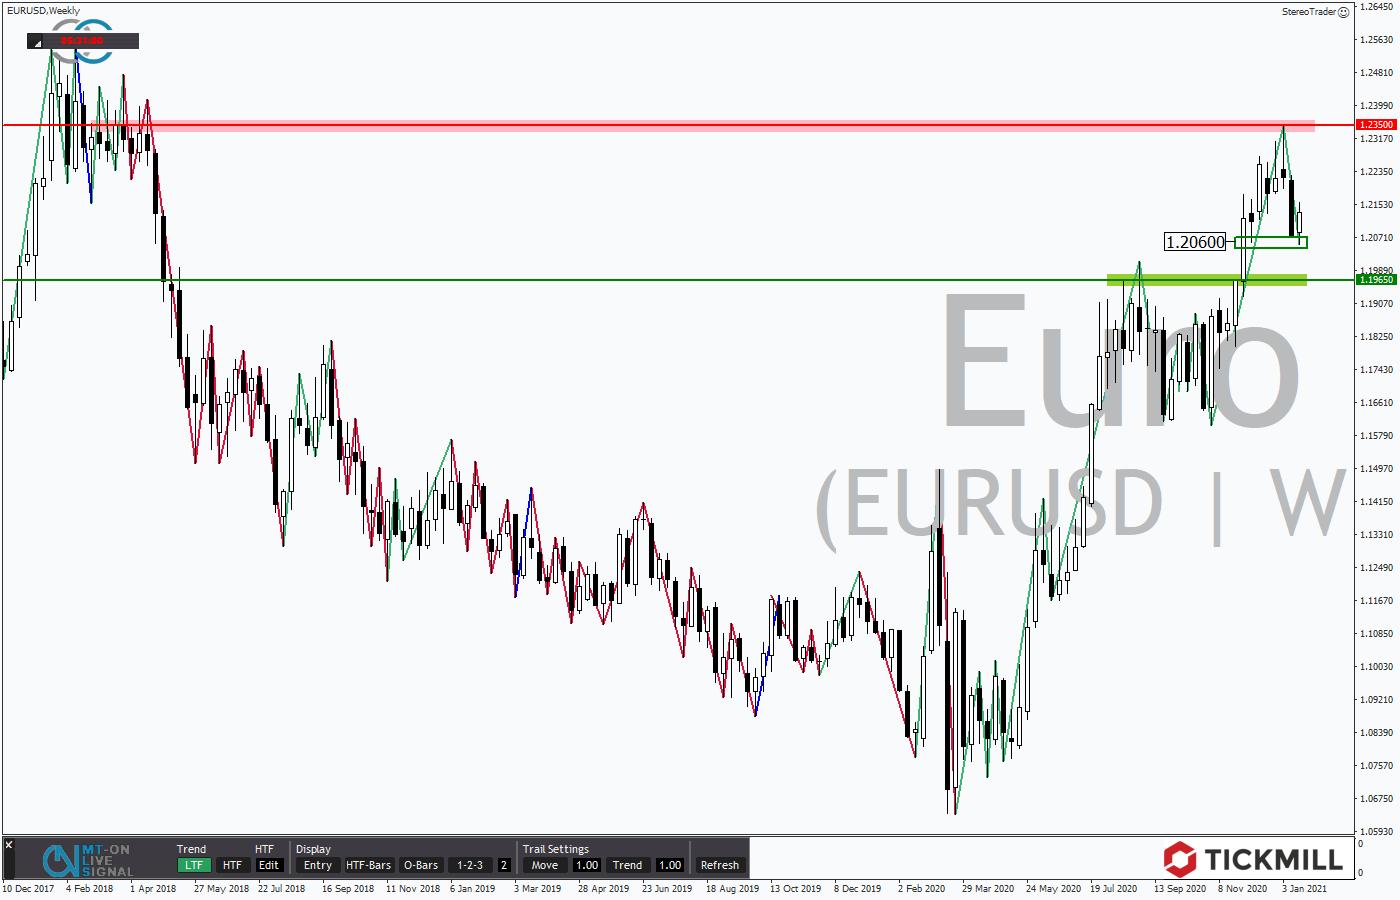 Tickmill-Analyse: Wochenchart im EURUSD